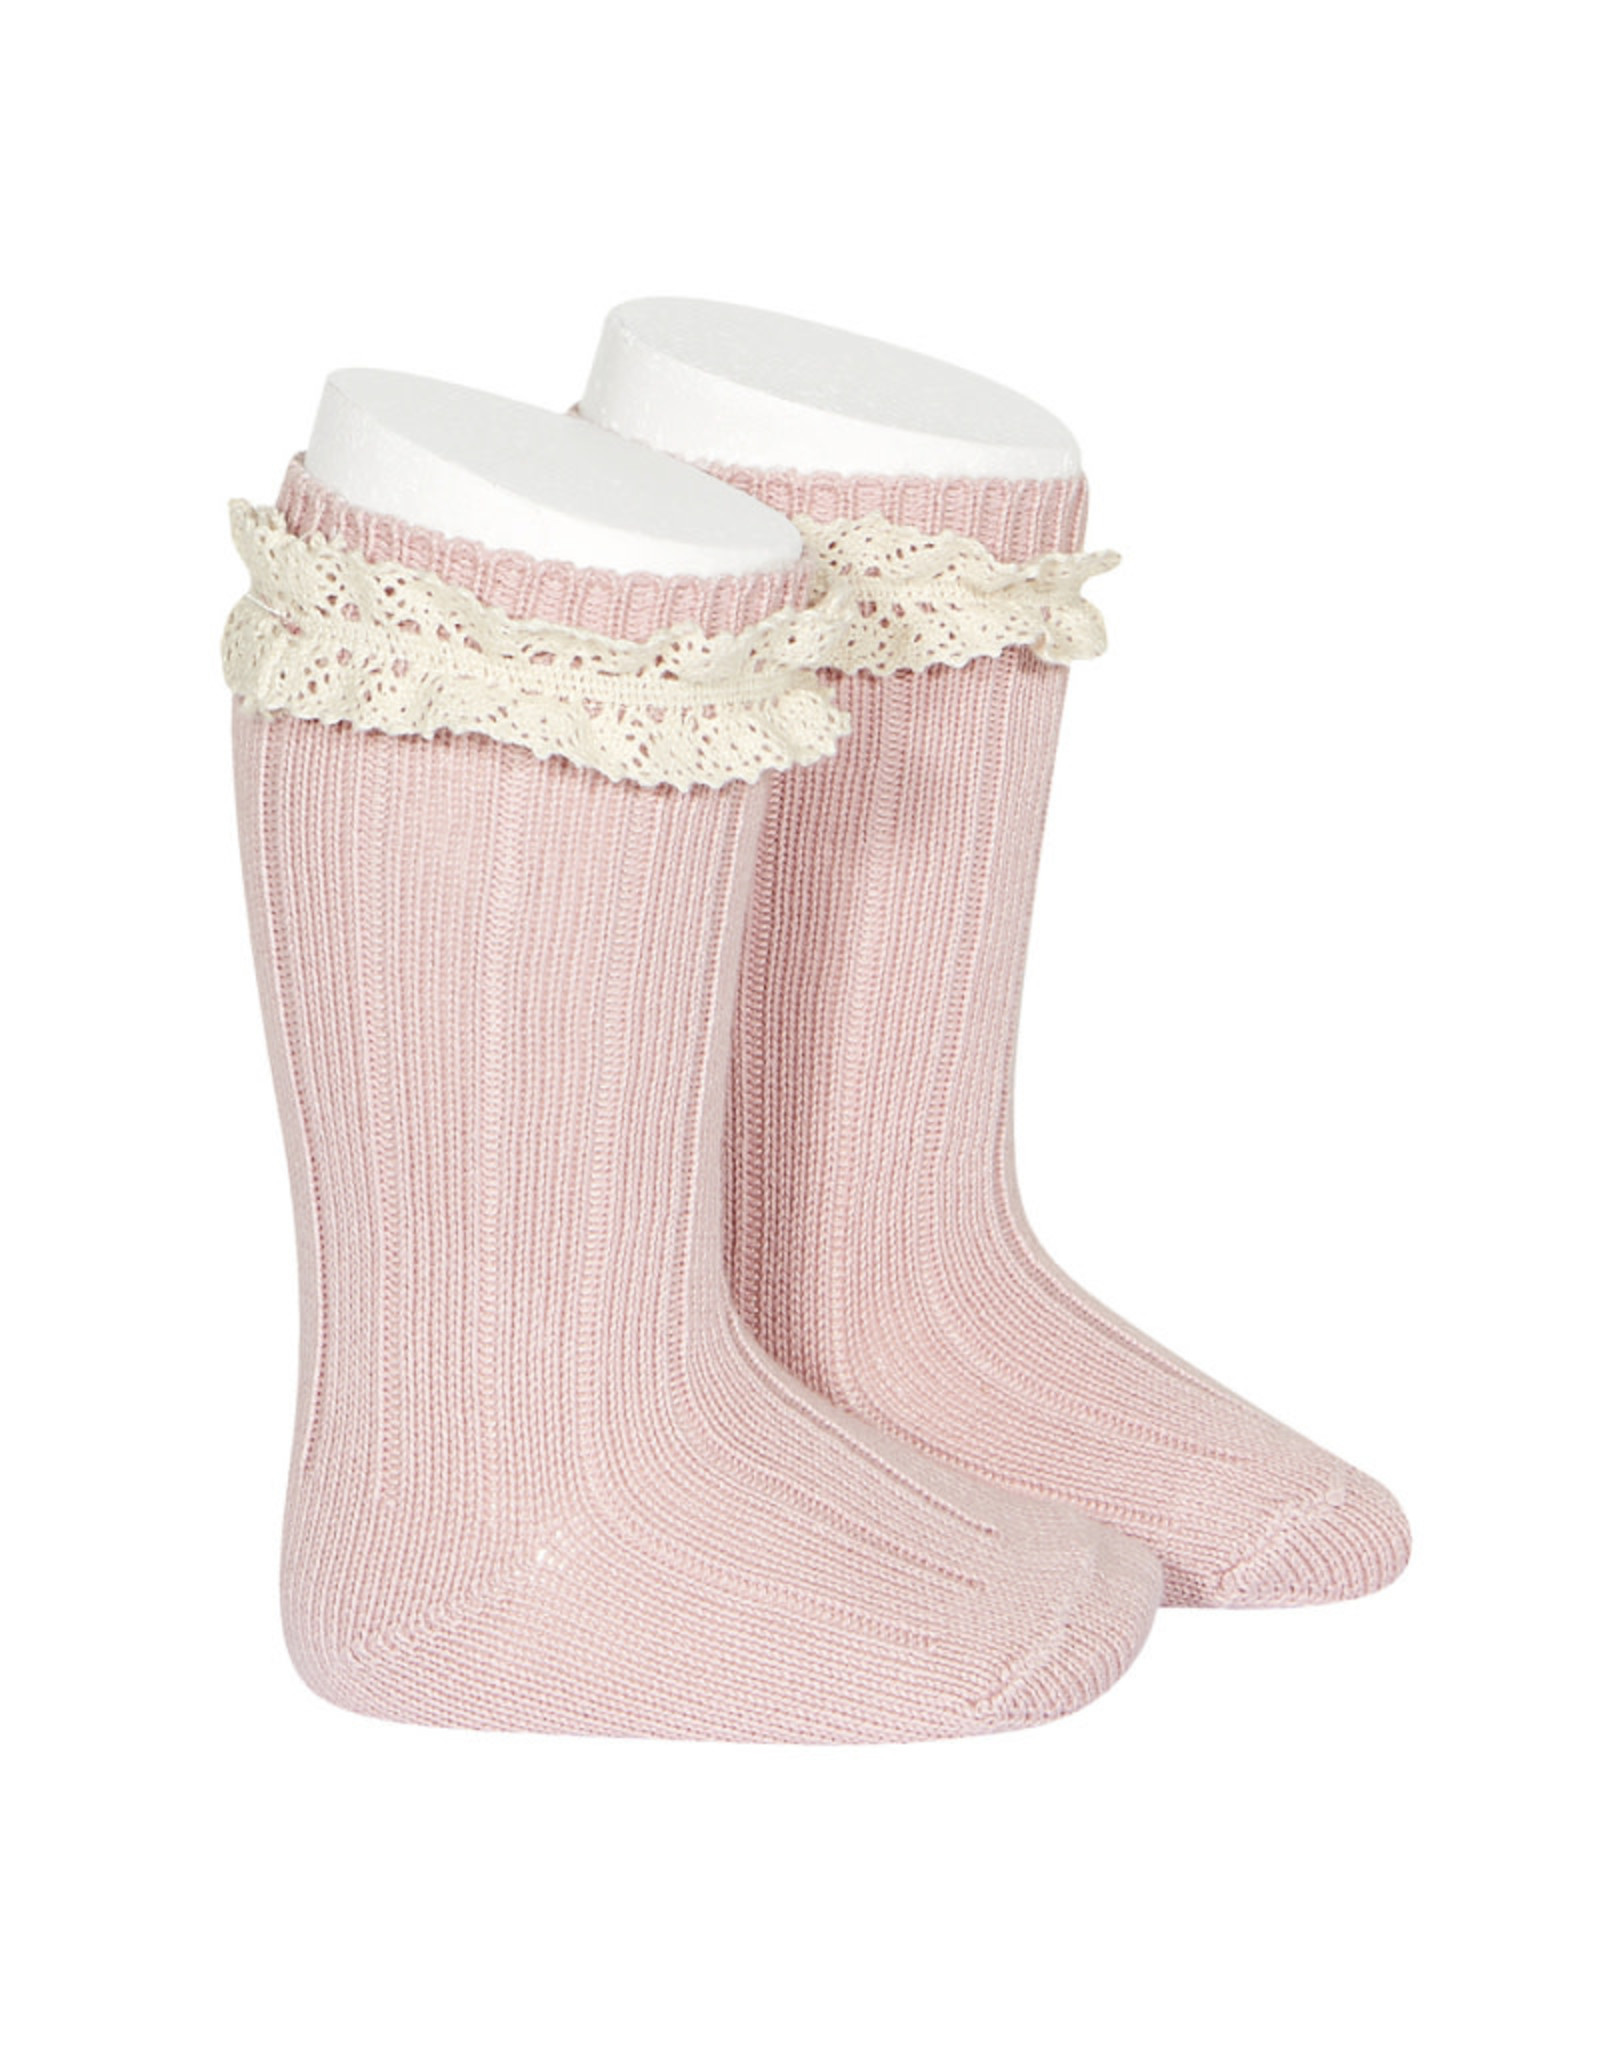 CONDOR Pale Pink Vintage Lace Socks